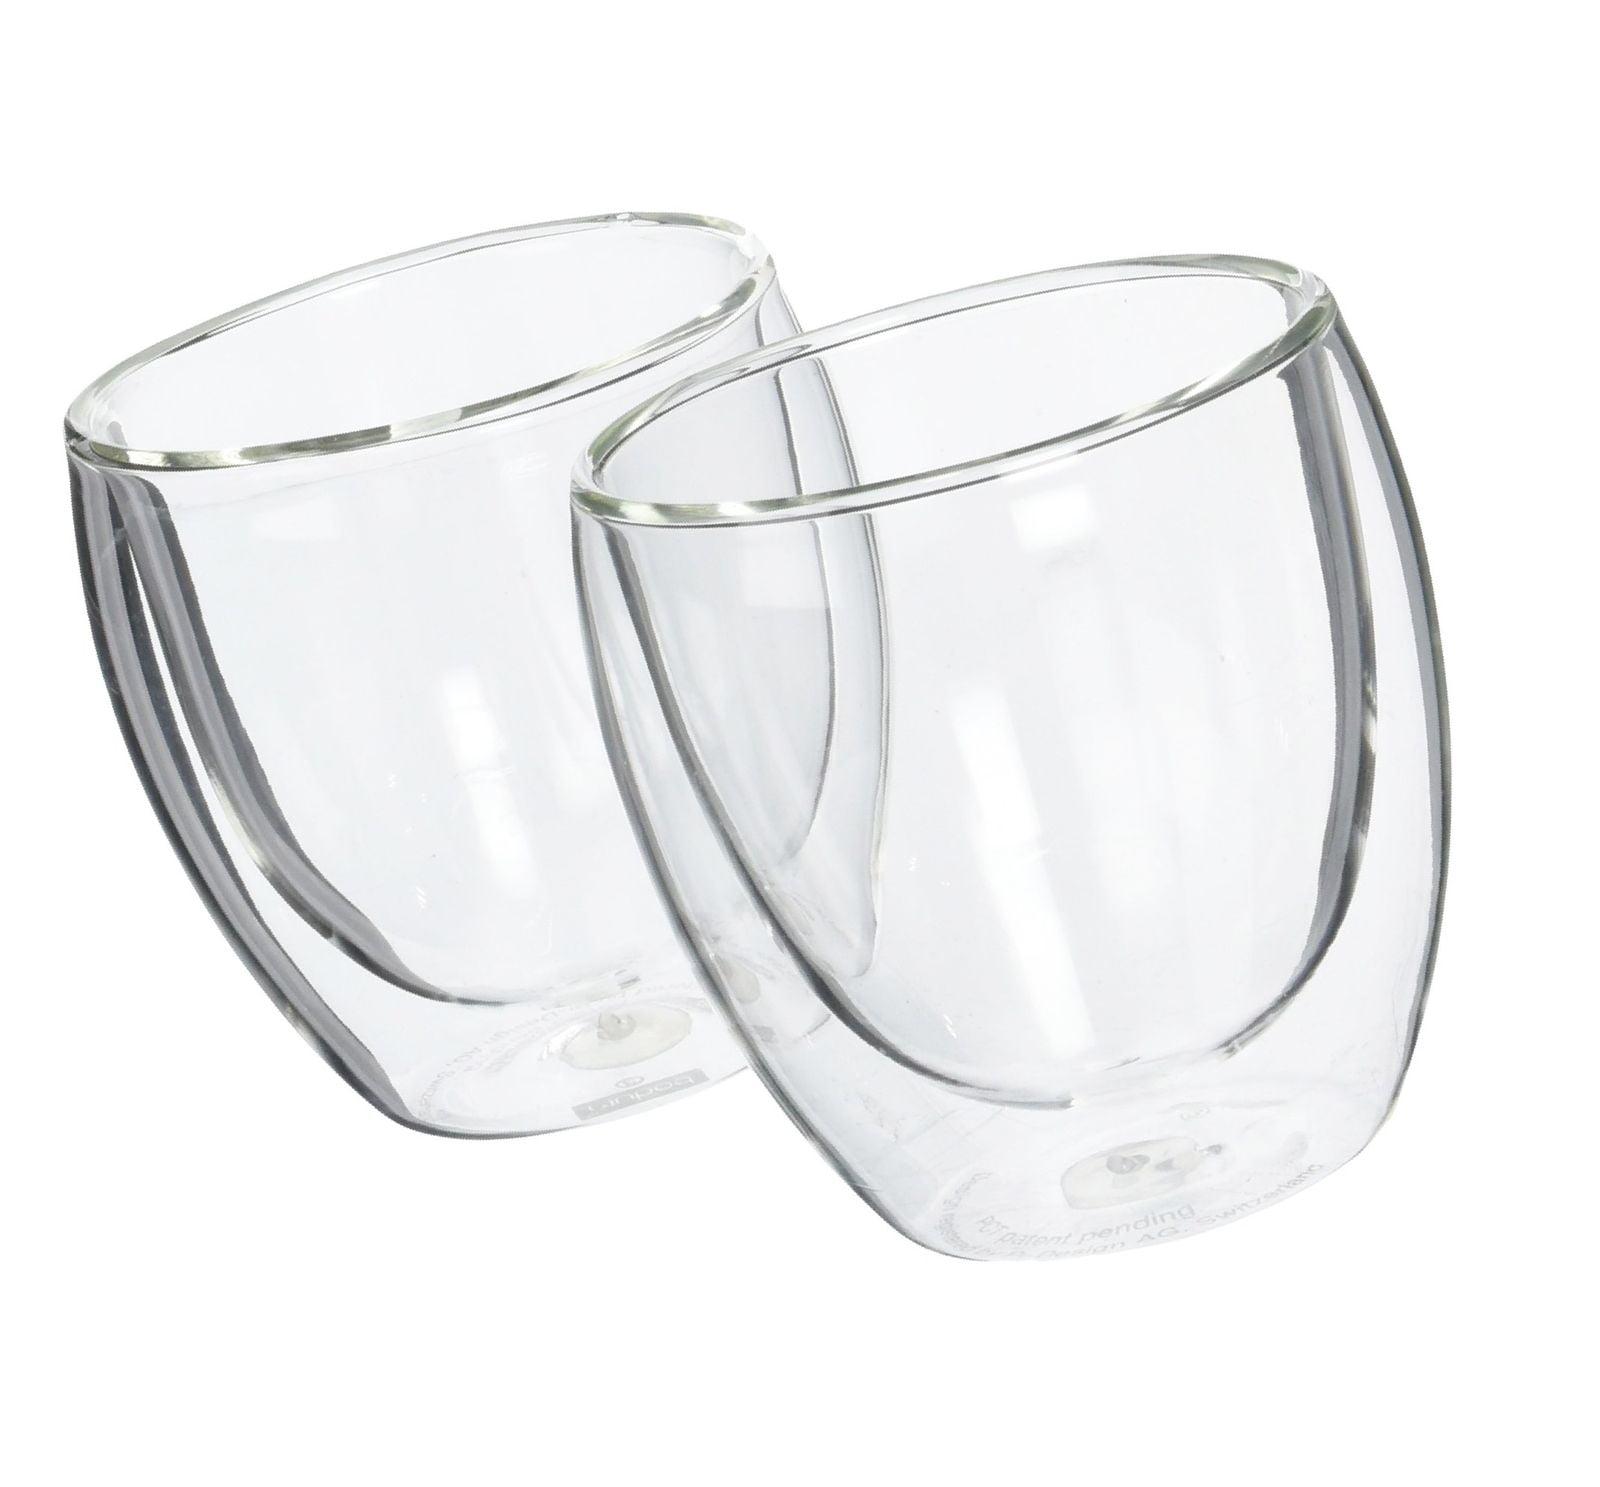 Bodum Pavina Glass, Double-Wall Insulated Glasses, Clear, 8 Ounces Each (Set ...